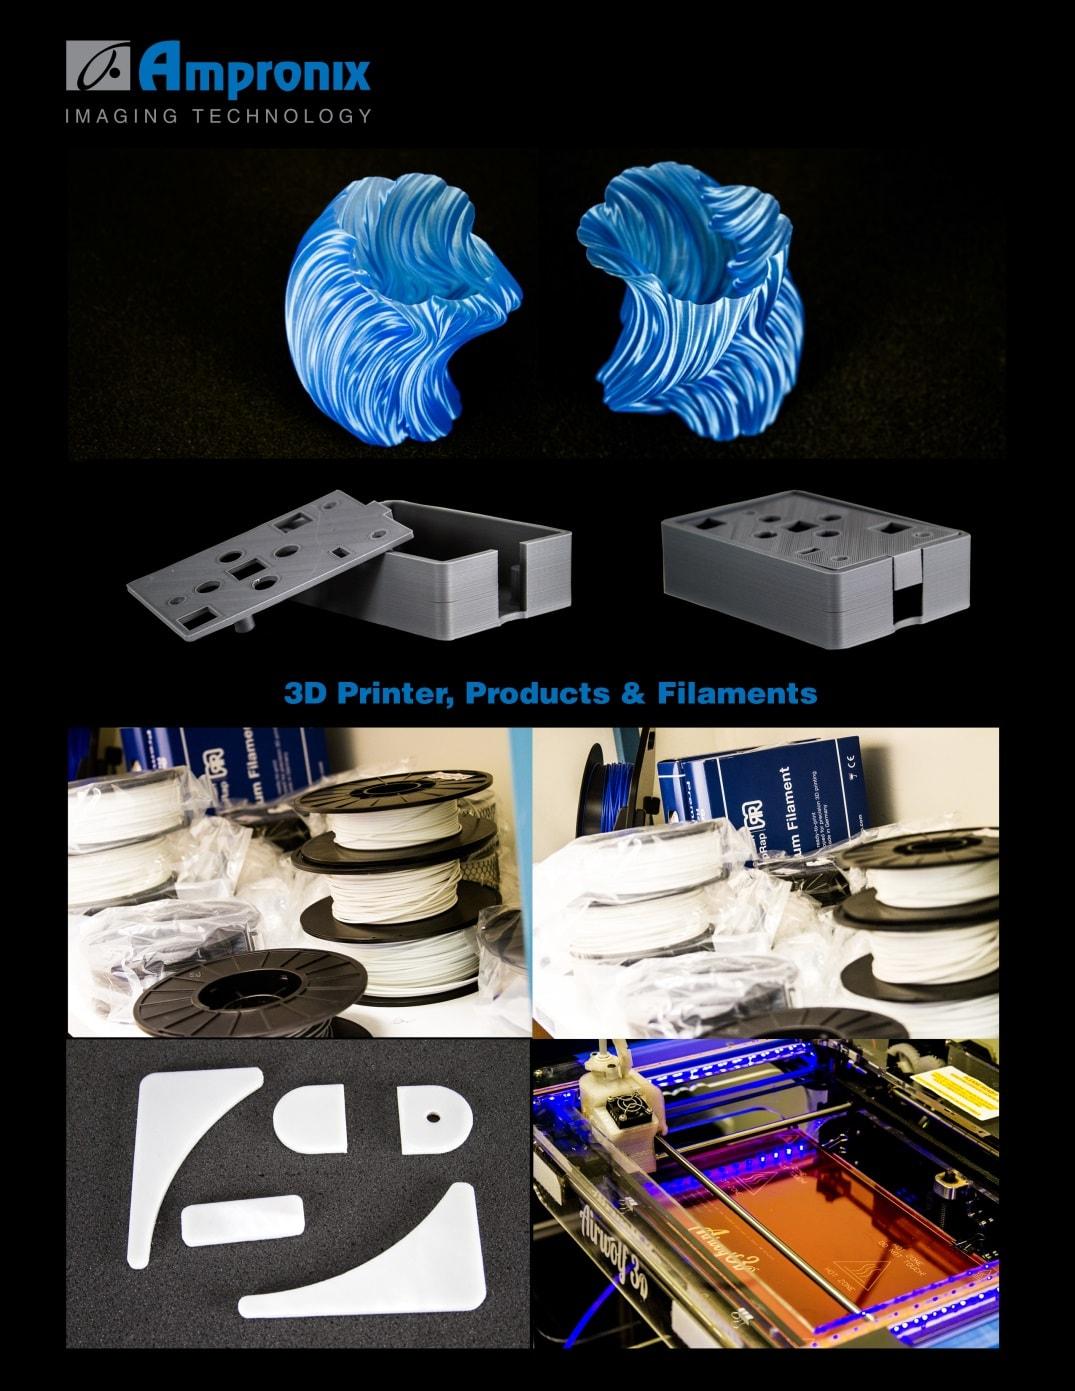 Ampronix 3D Printing by Ampronix News